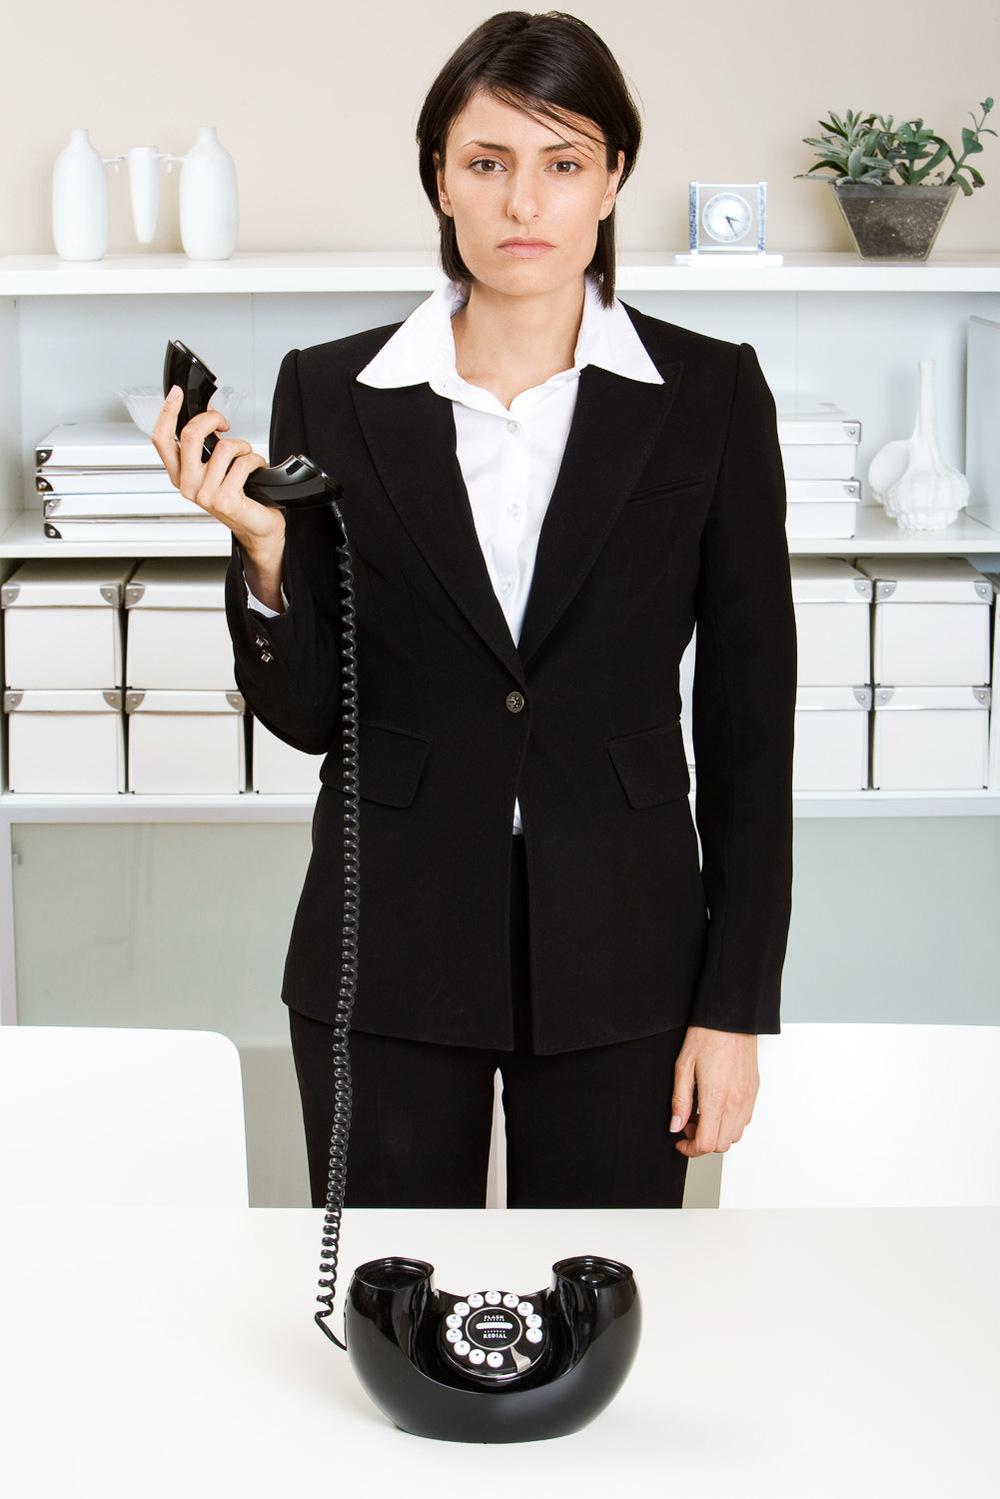 mod office phone girl.jpg